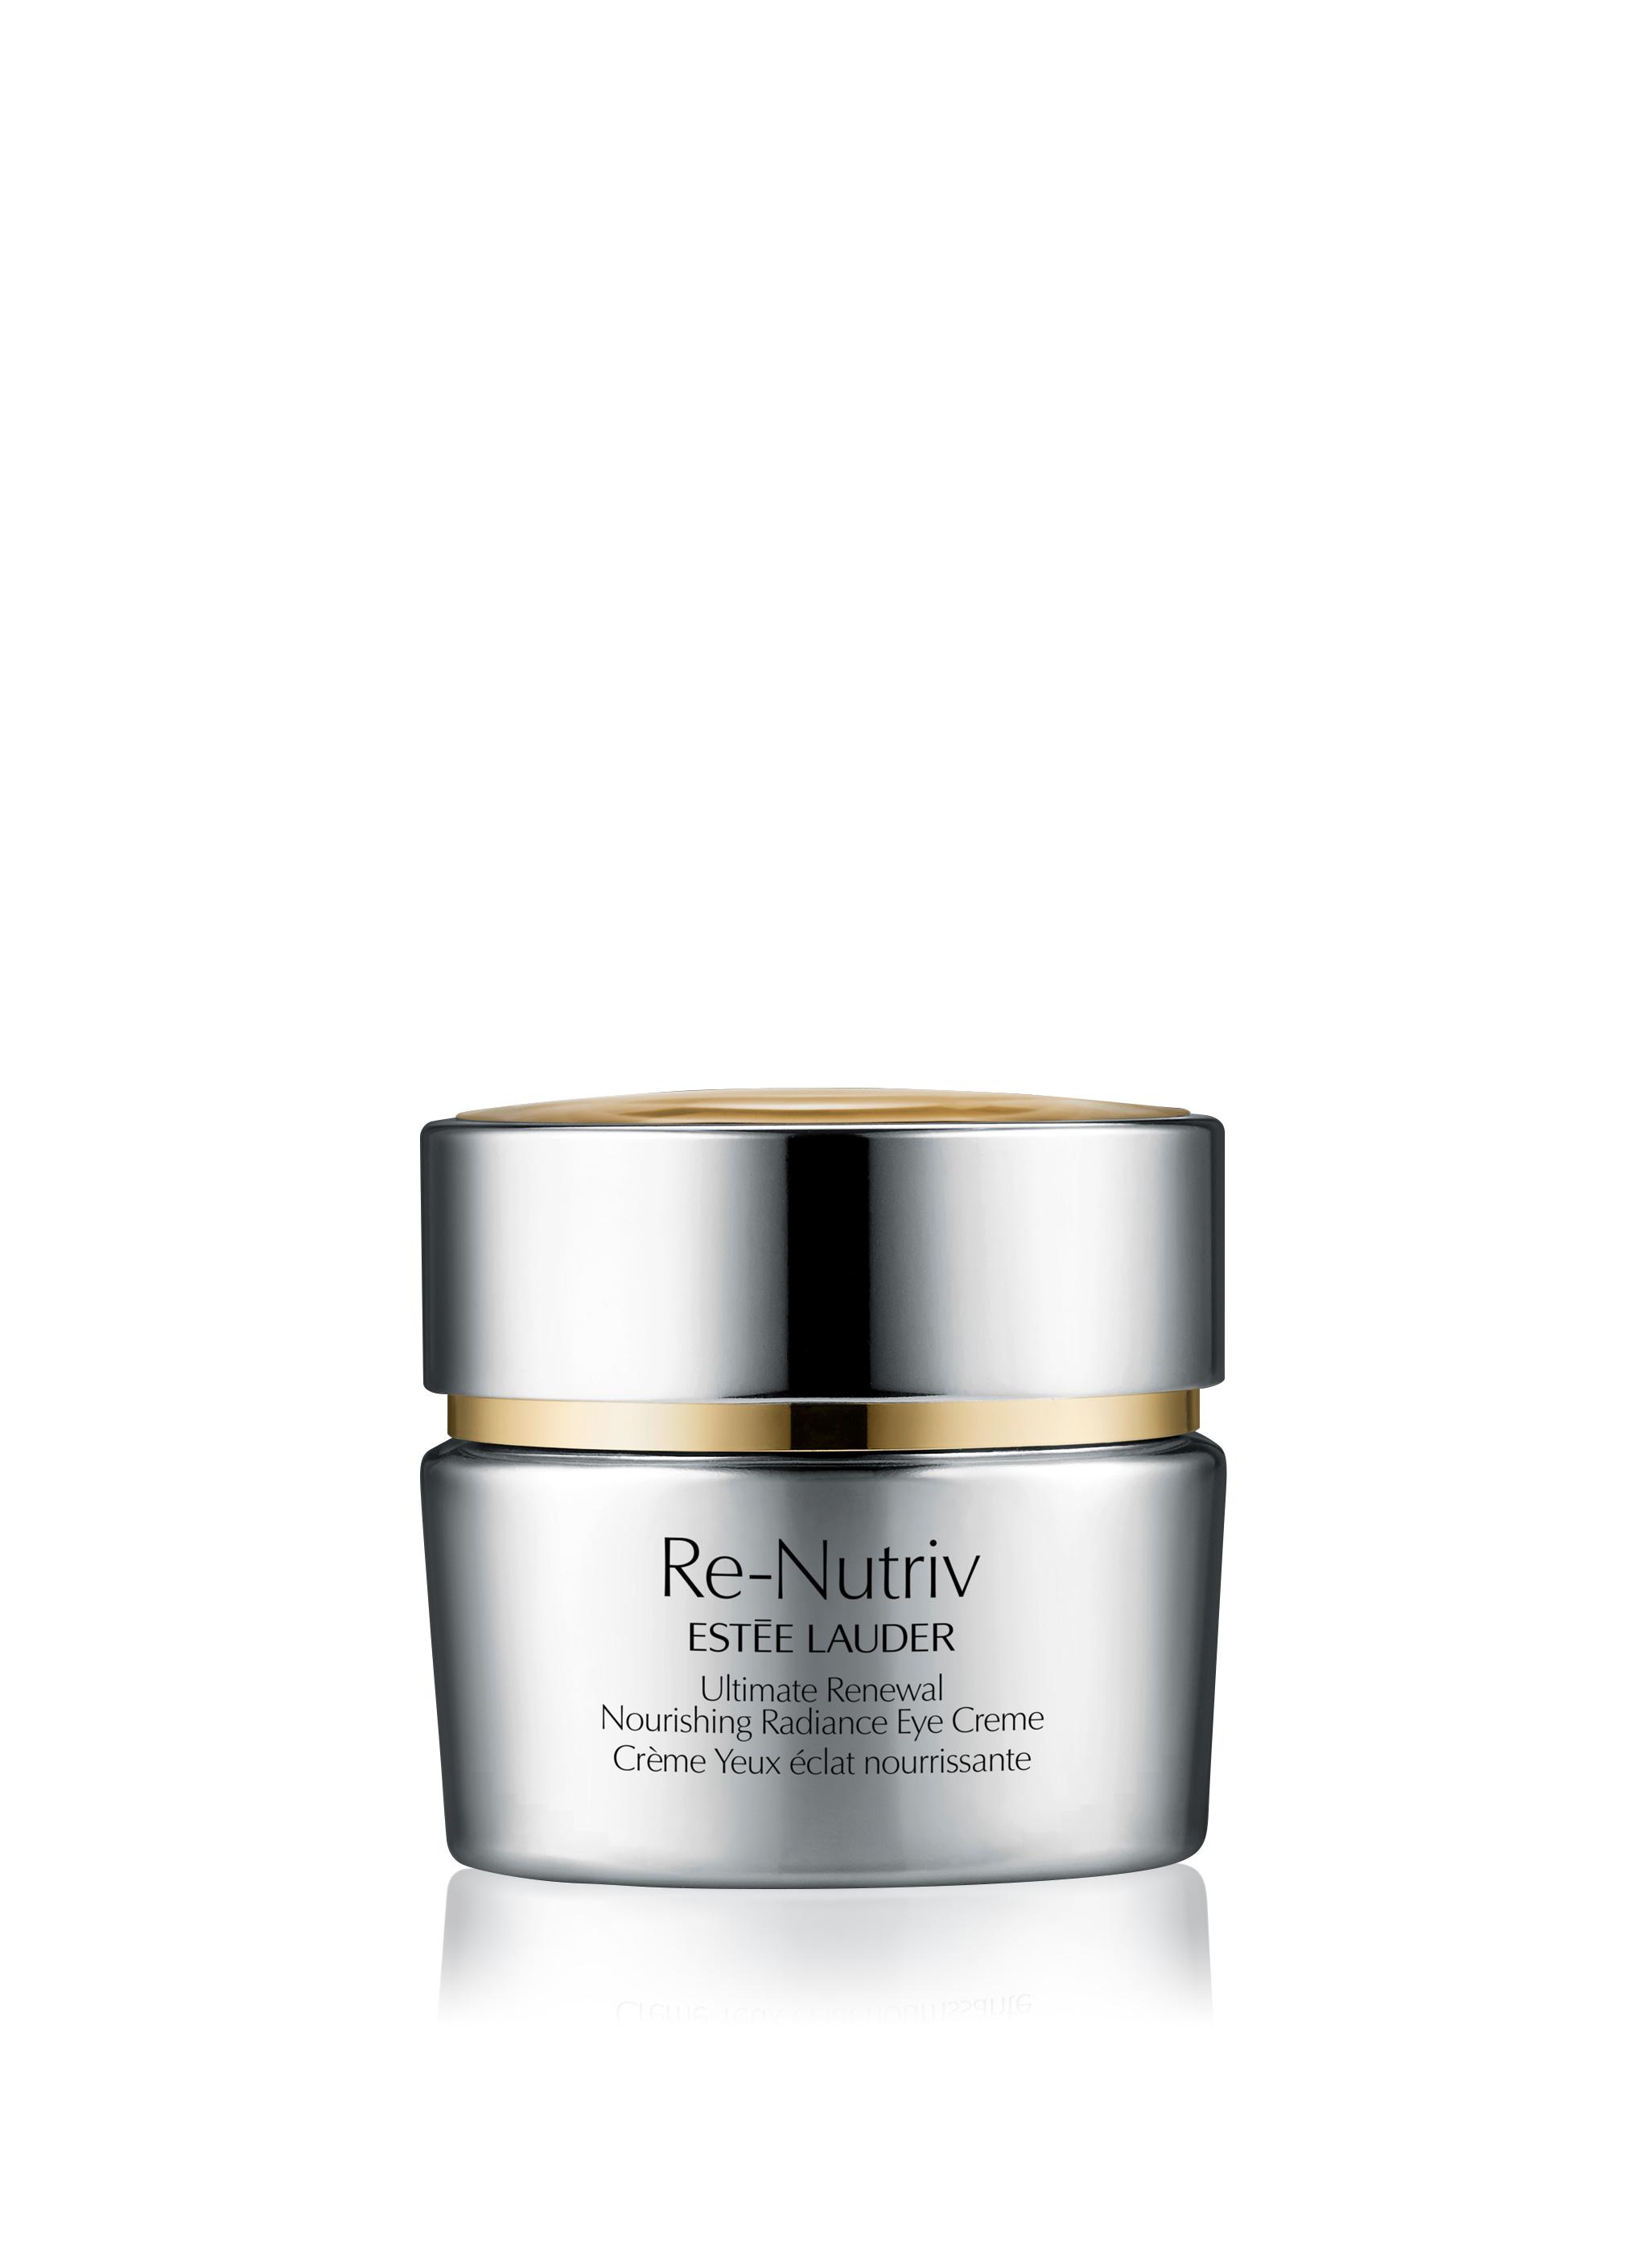 Re-Nutriv Ultimate Renewal Eye Cream 15ml